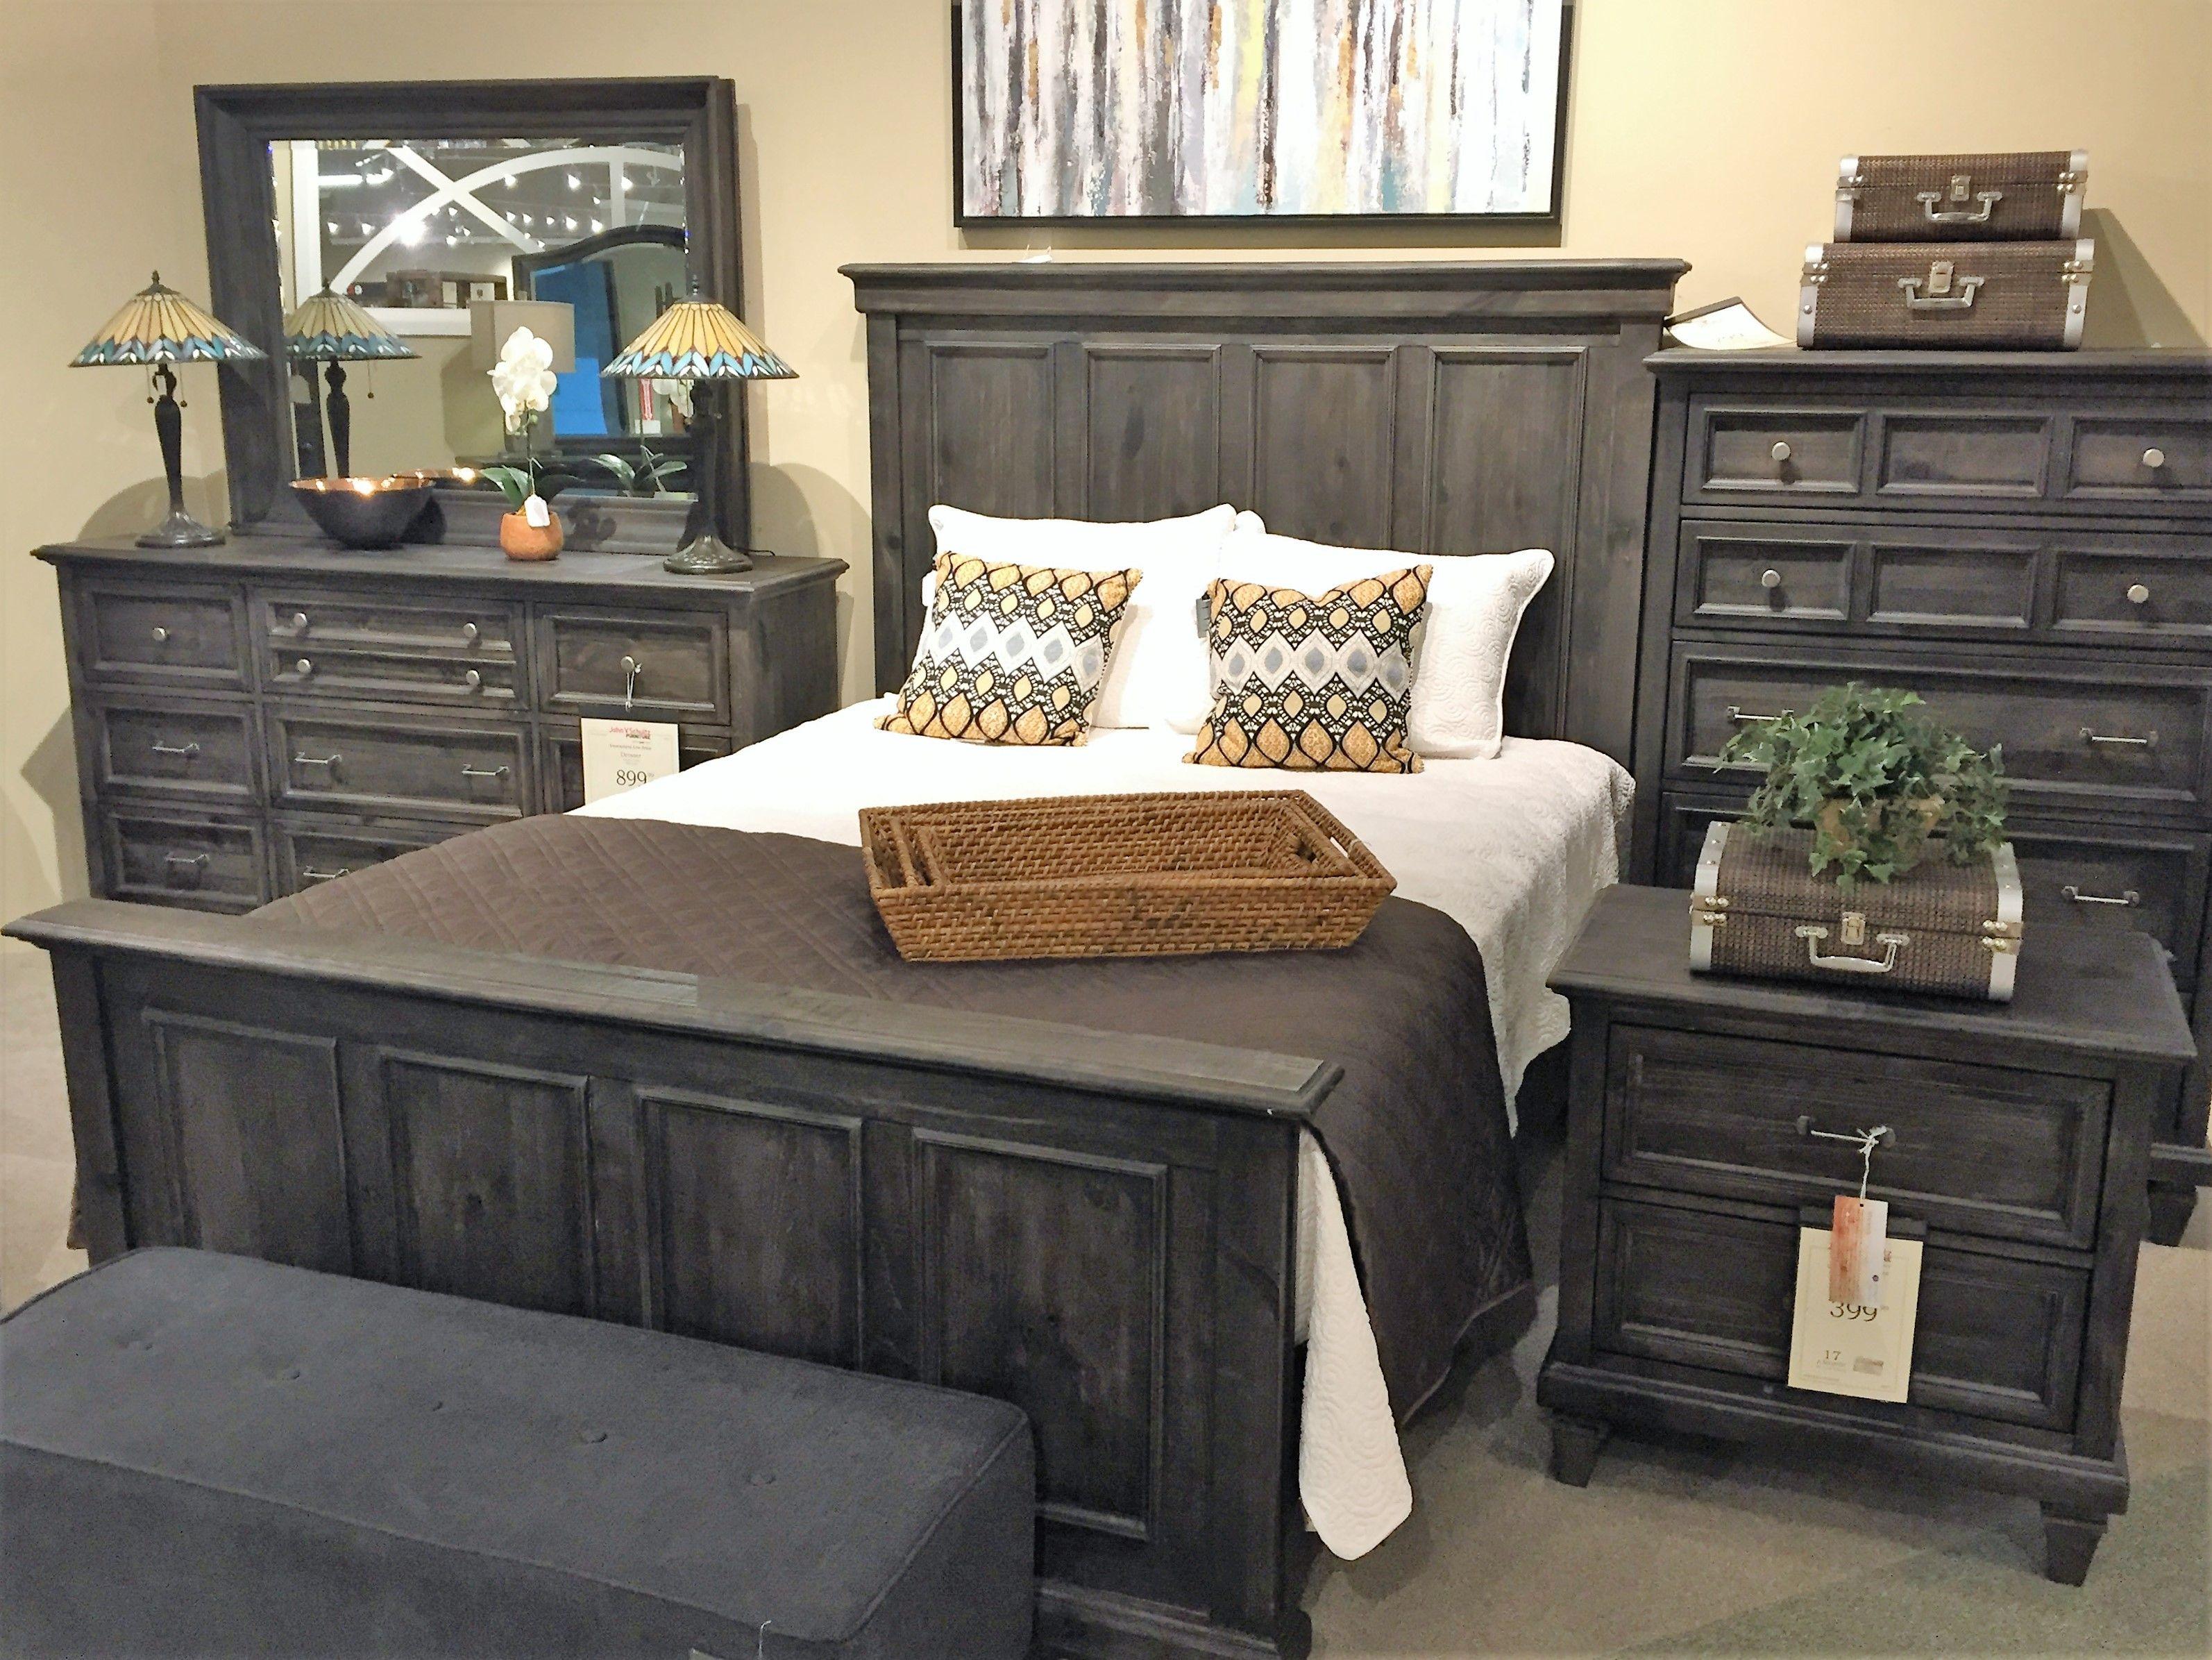 Shop For The Magnussen Home Calistoga Queen Bedroom Group At John V Schultz  Furniture   Your Erie, Meadville, Pittsburgh, Warren, Pennsylvania Furniture  ...